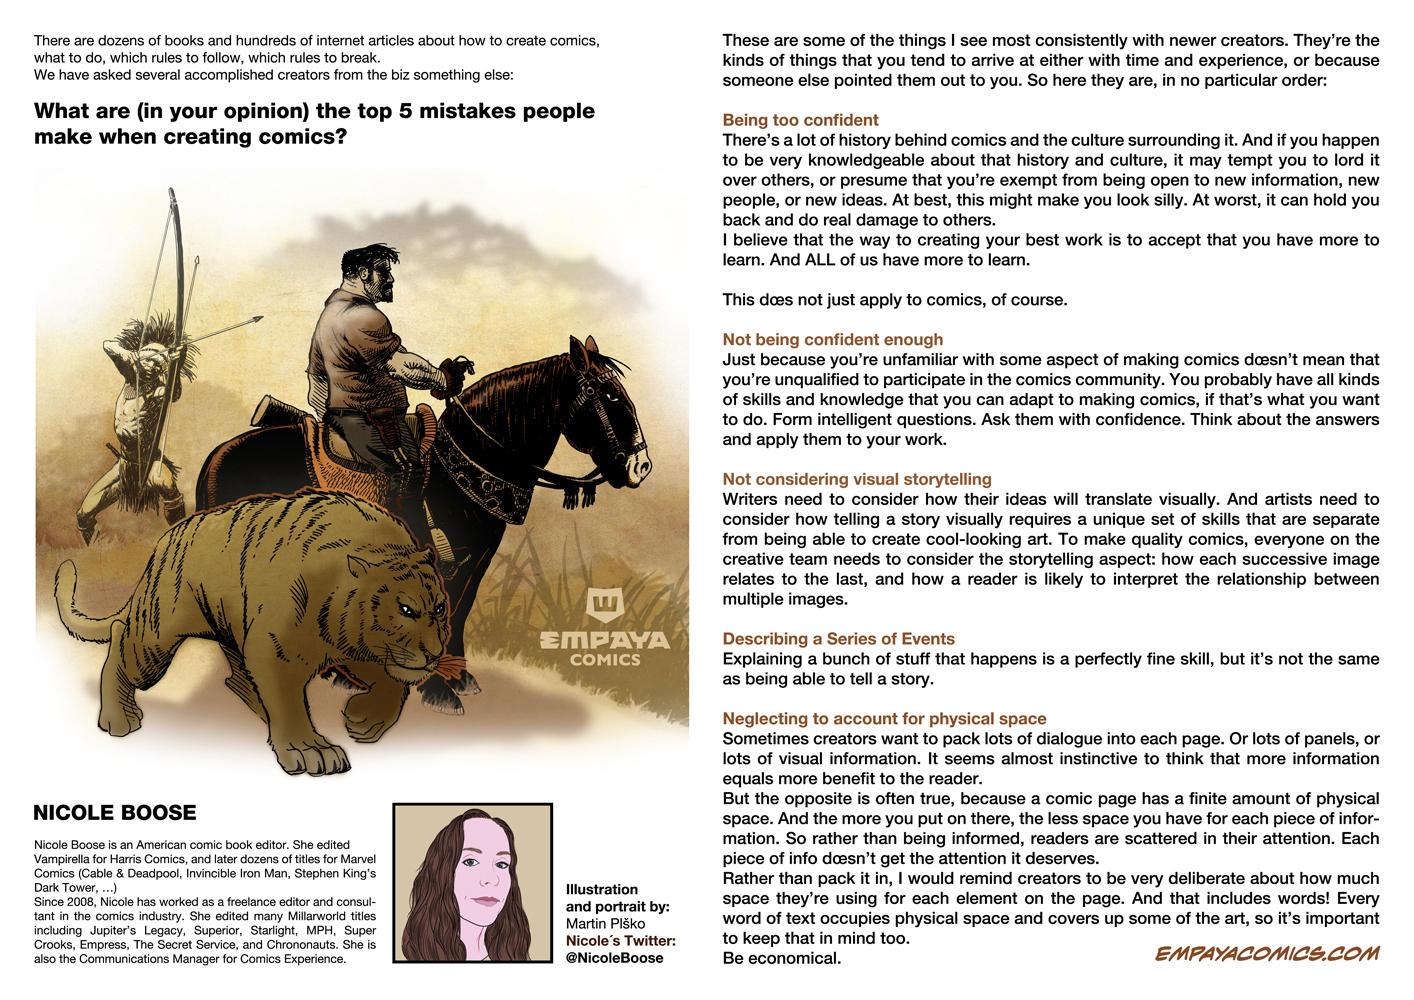 Top 5 mistakes when creating comics: Nicole Boose by EMPAYAcomics